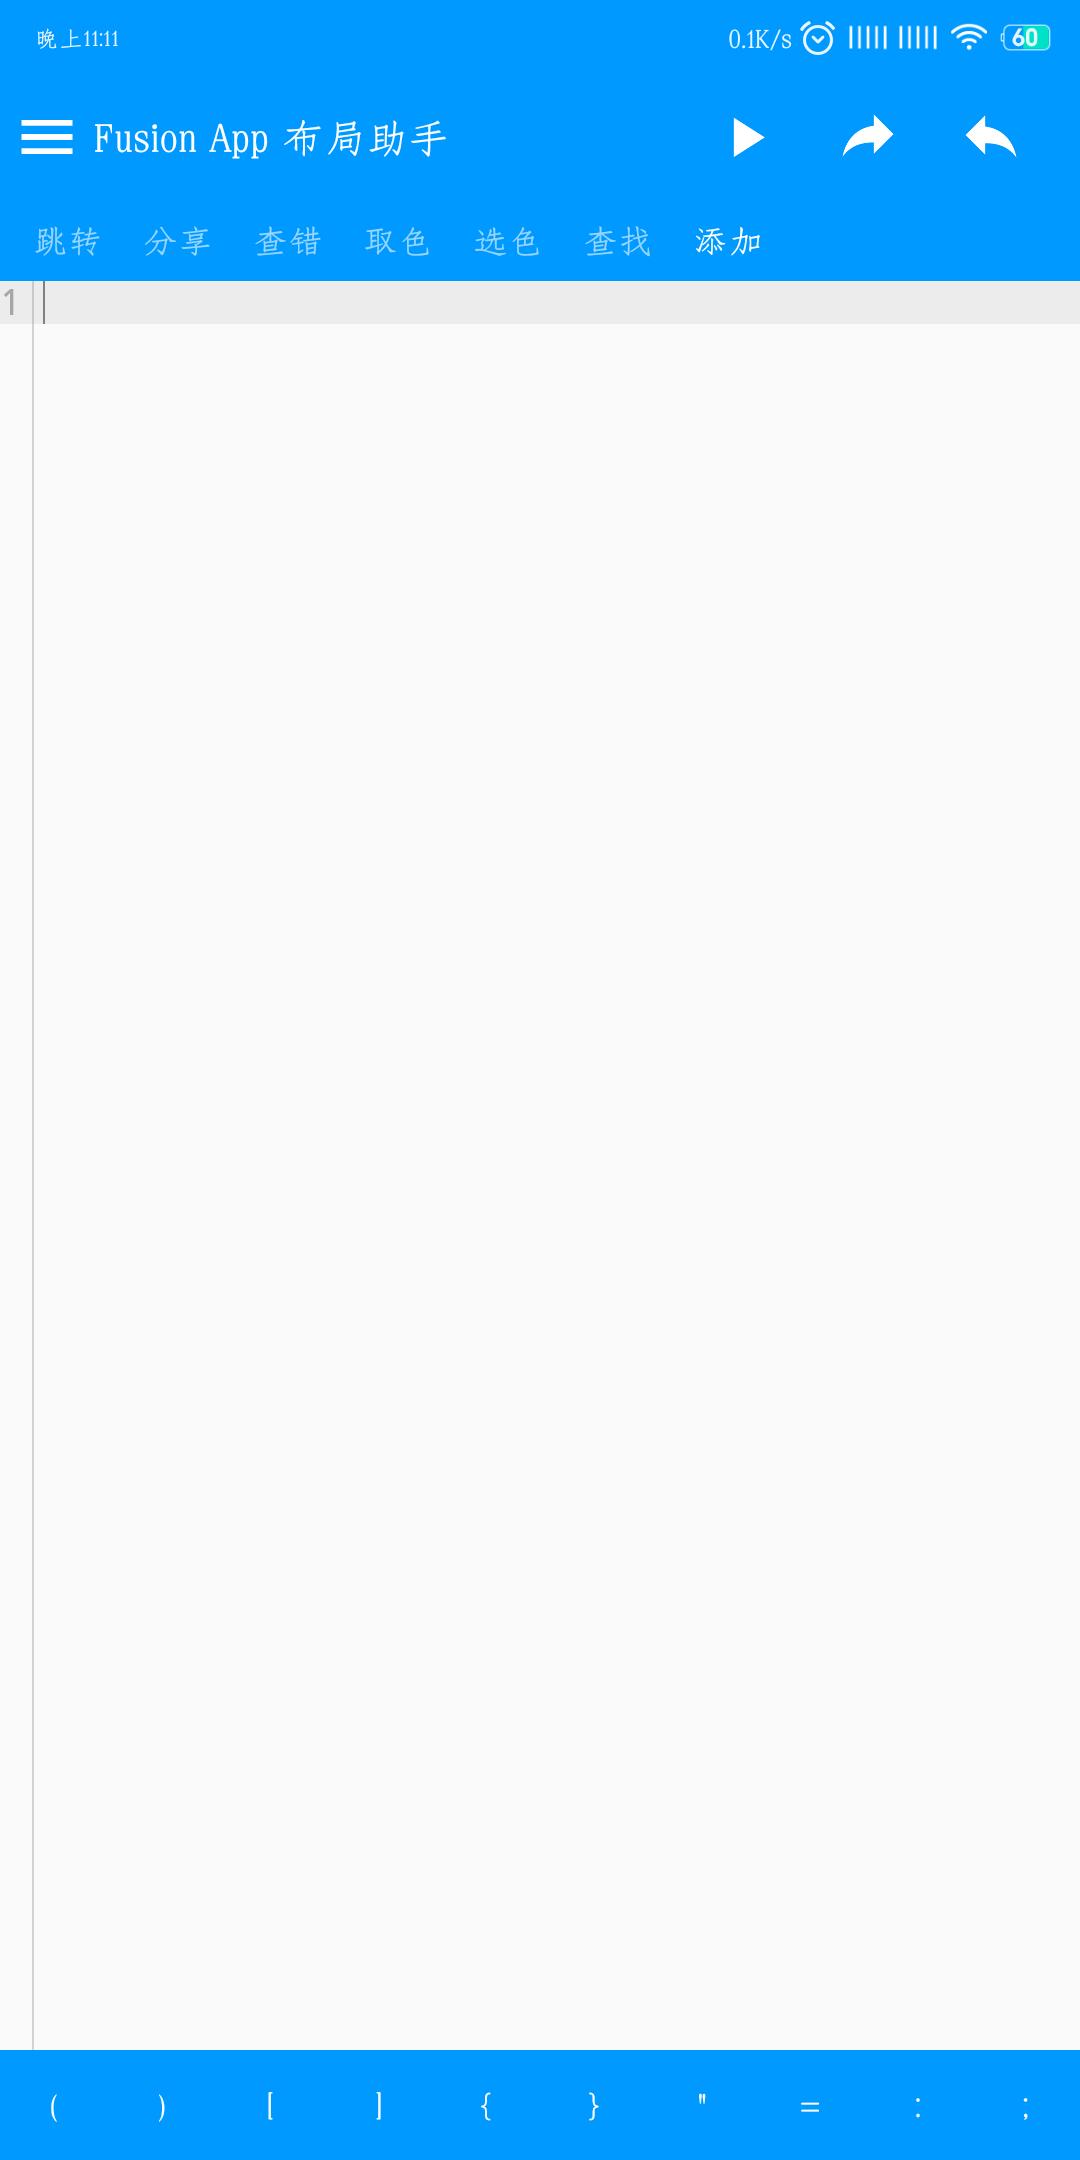 Fusion App 布局助手 1.4.8.0Beta0.03 让小白对布局不再陌生